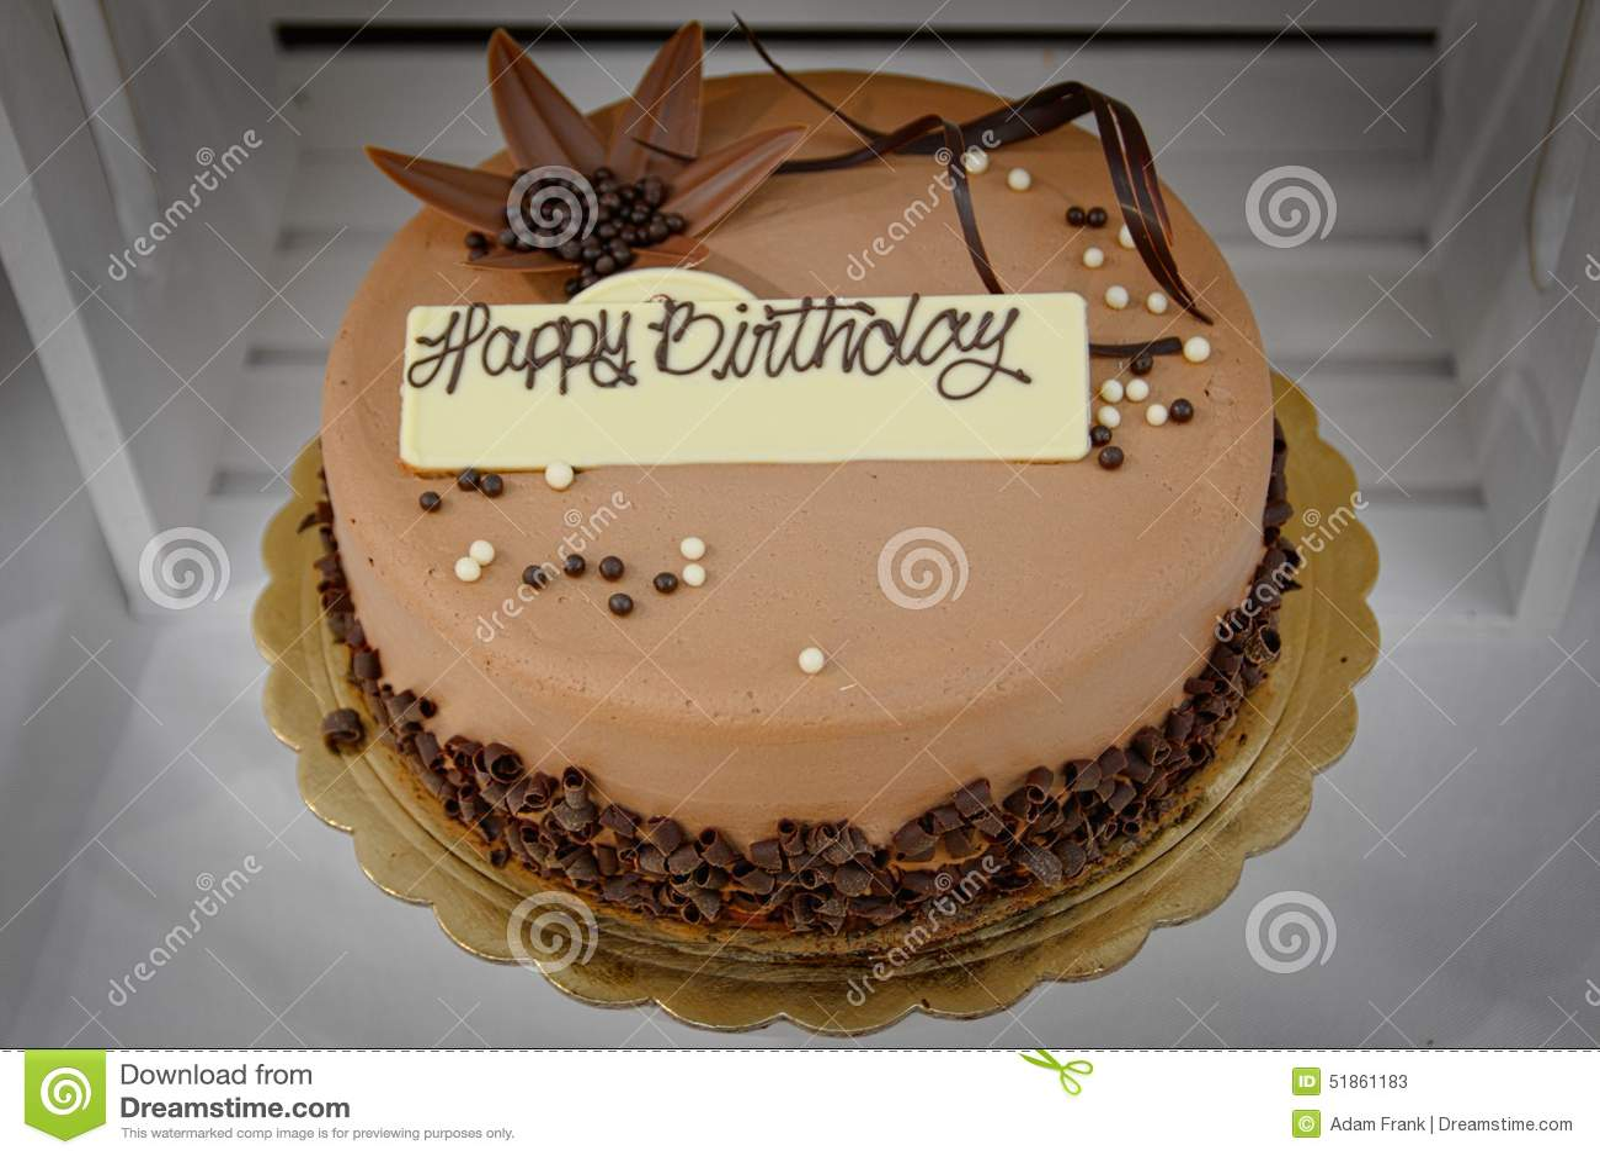 Chocolate Birthday Cake With Happy Sign Stock Image